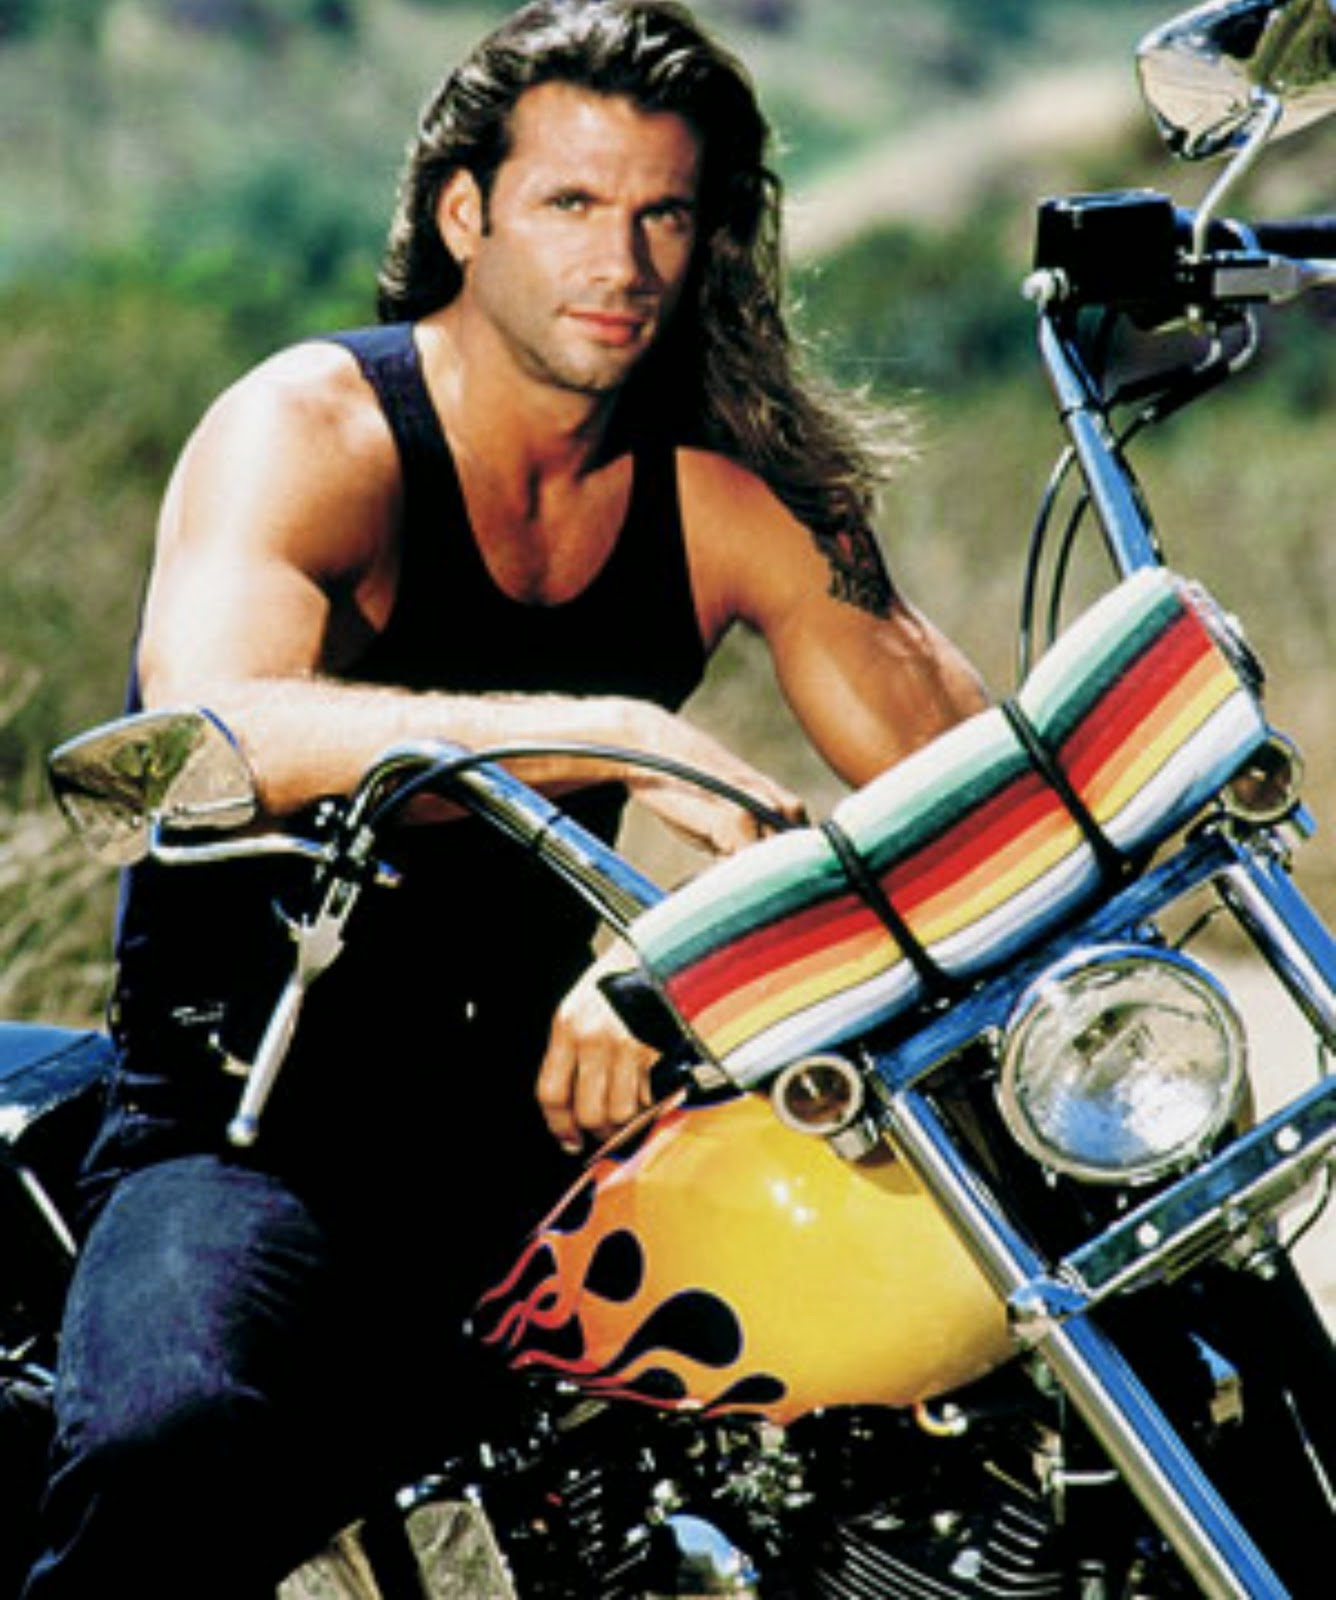 The girl on a motorcycle: Che moto mi prendo?